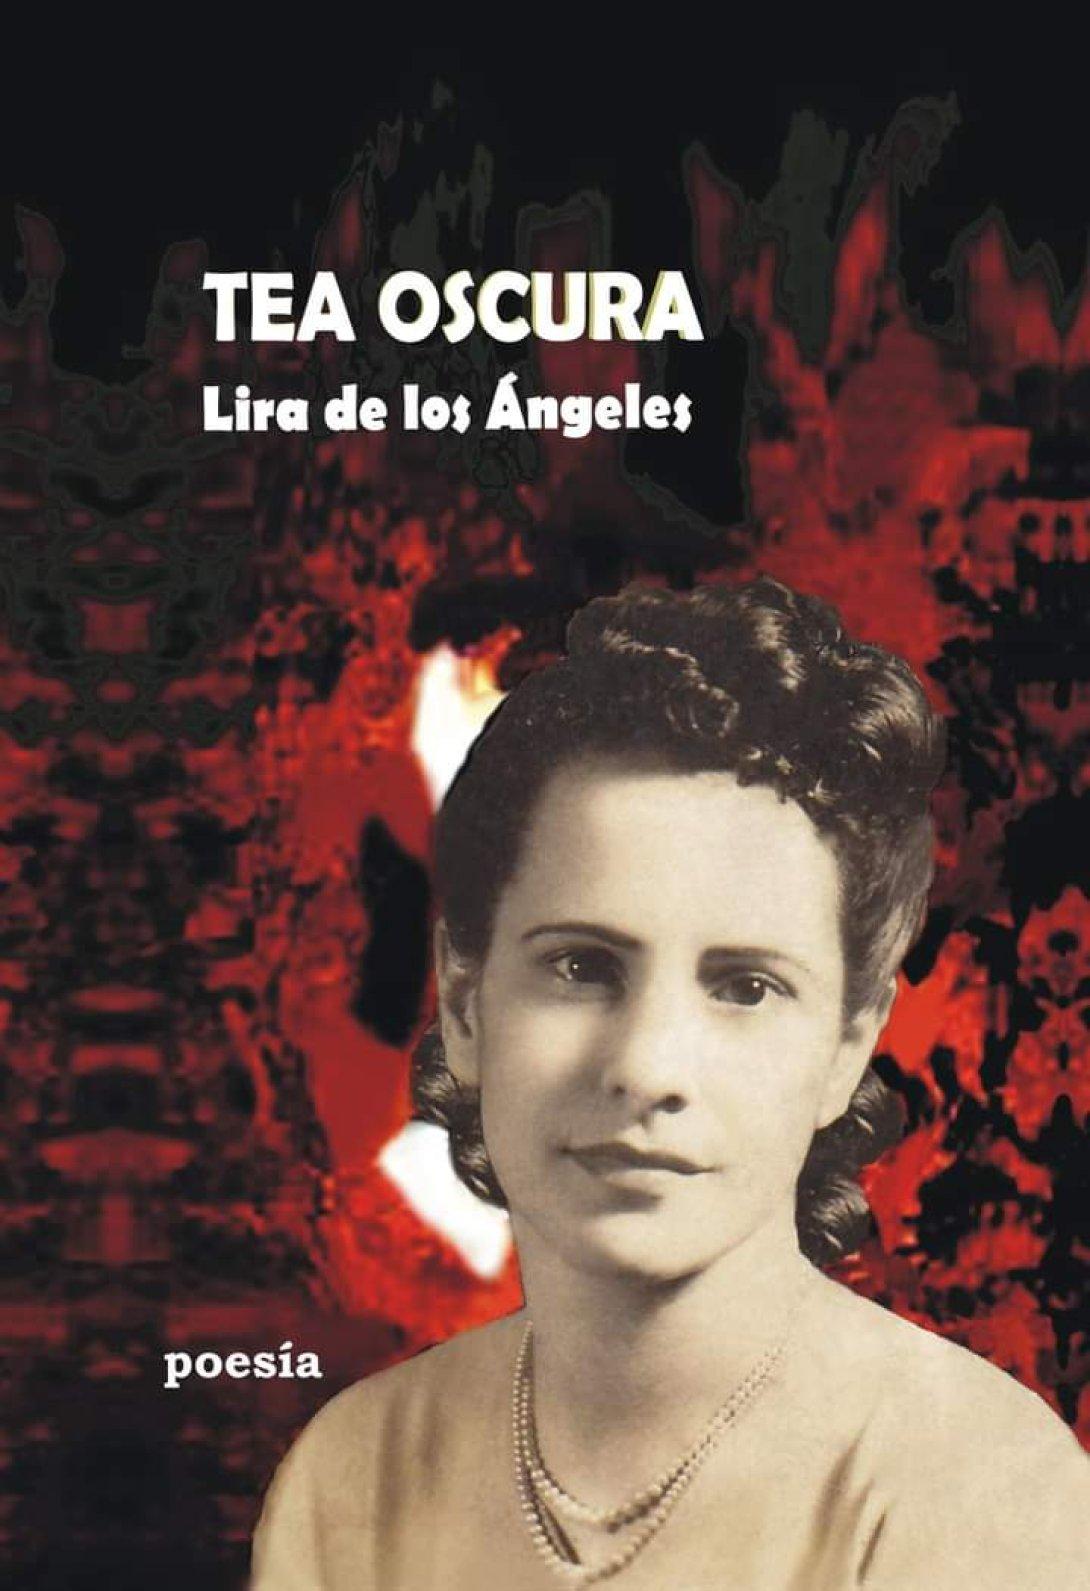 Tea-Oscura-Lira-de-Angeles